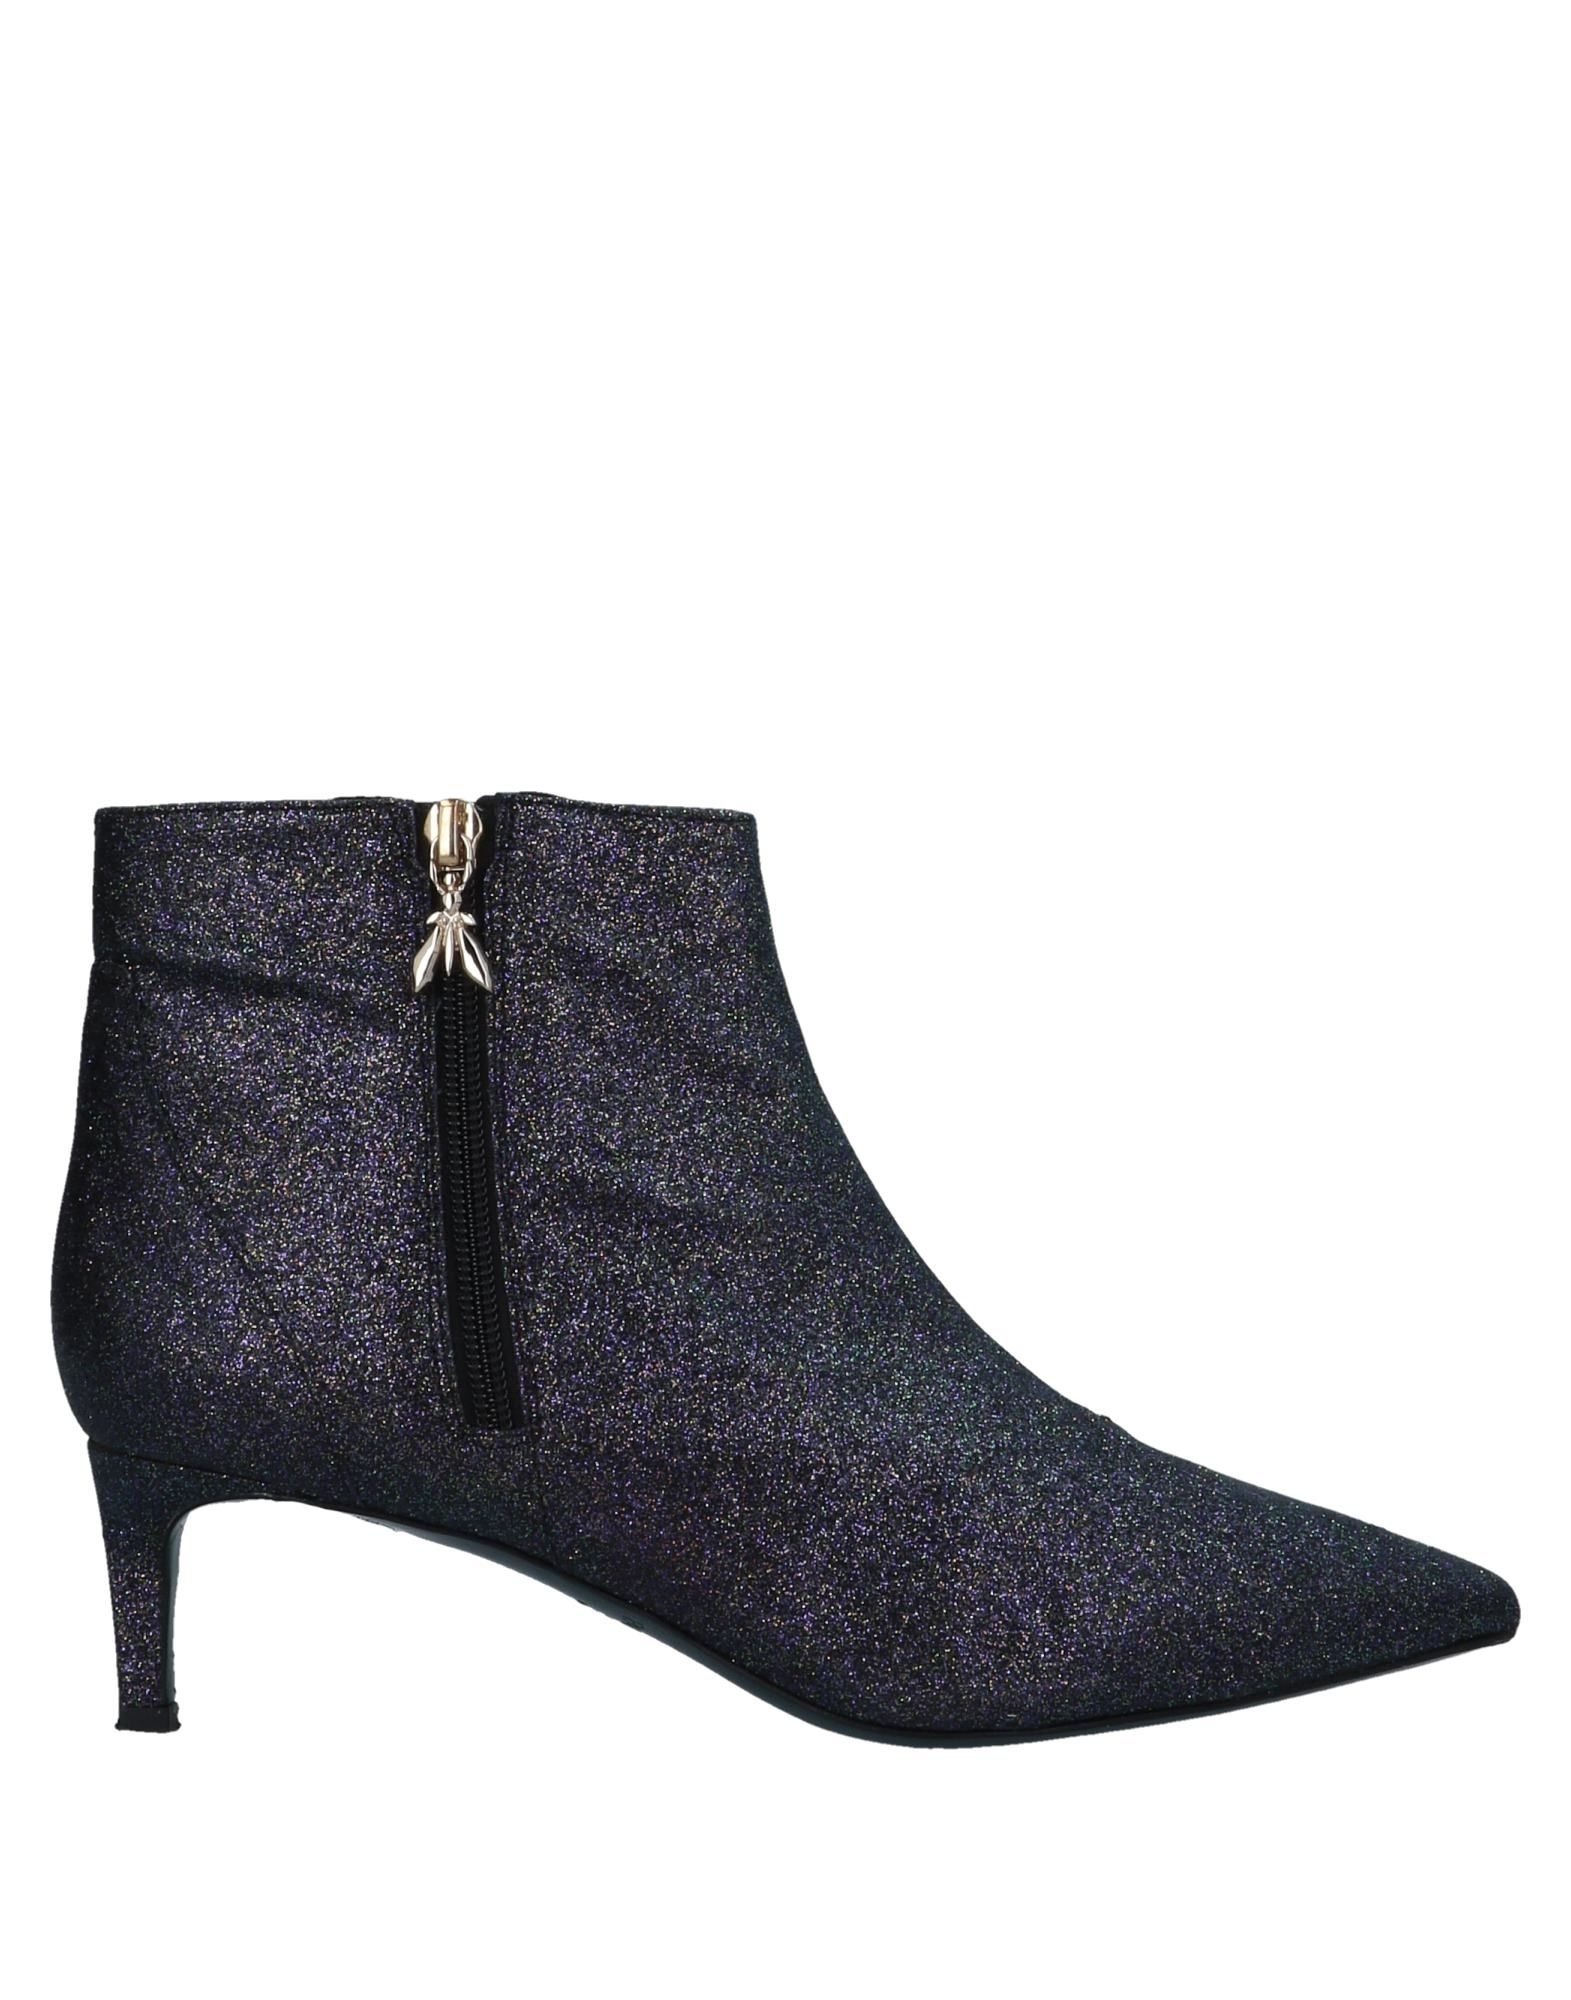 Patrizia Pepe Stiefelette Damen  11533992REGut aussehende strapazierfähige Schuhe